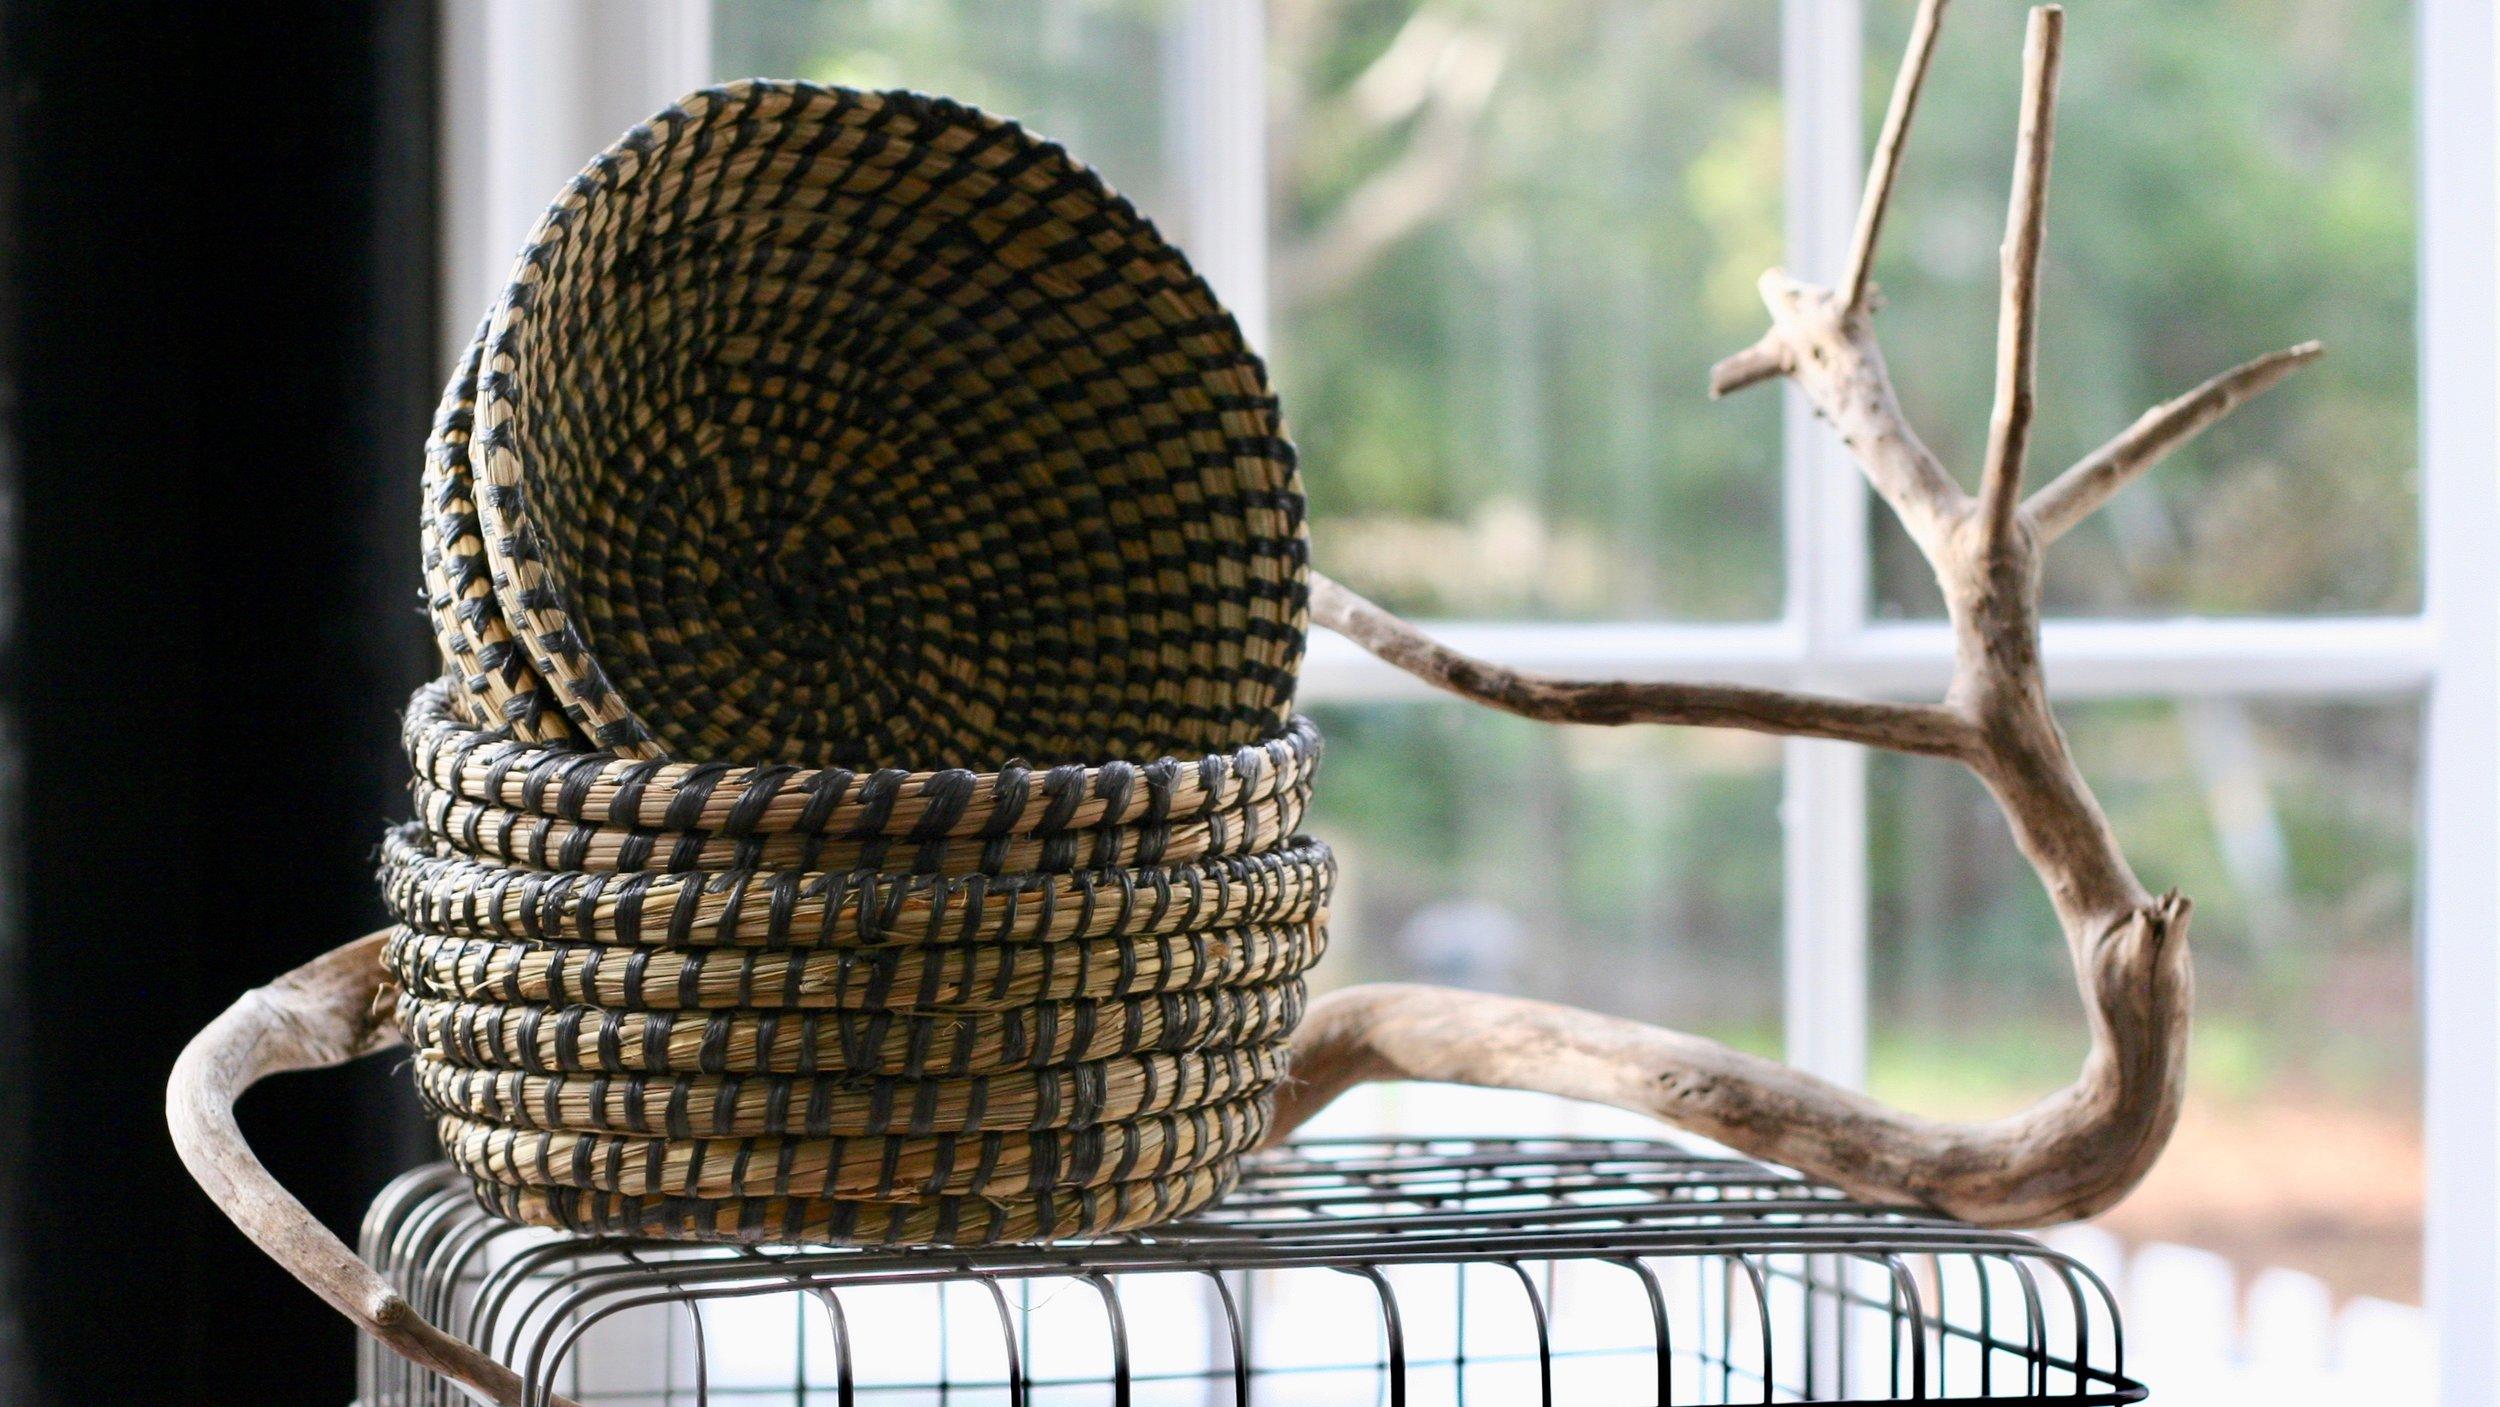 Mesa bread baskets.jpeg